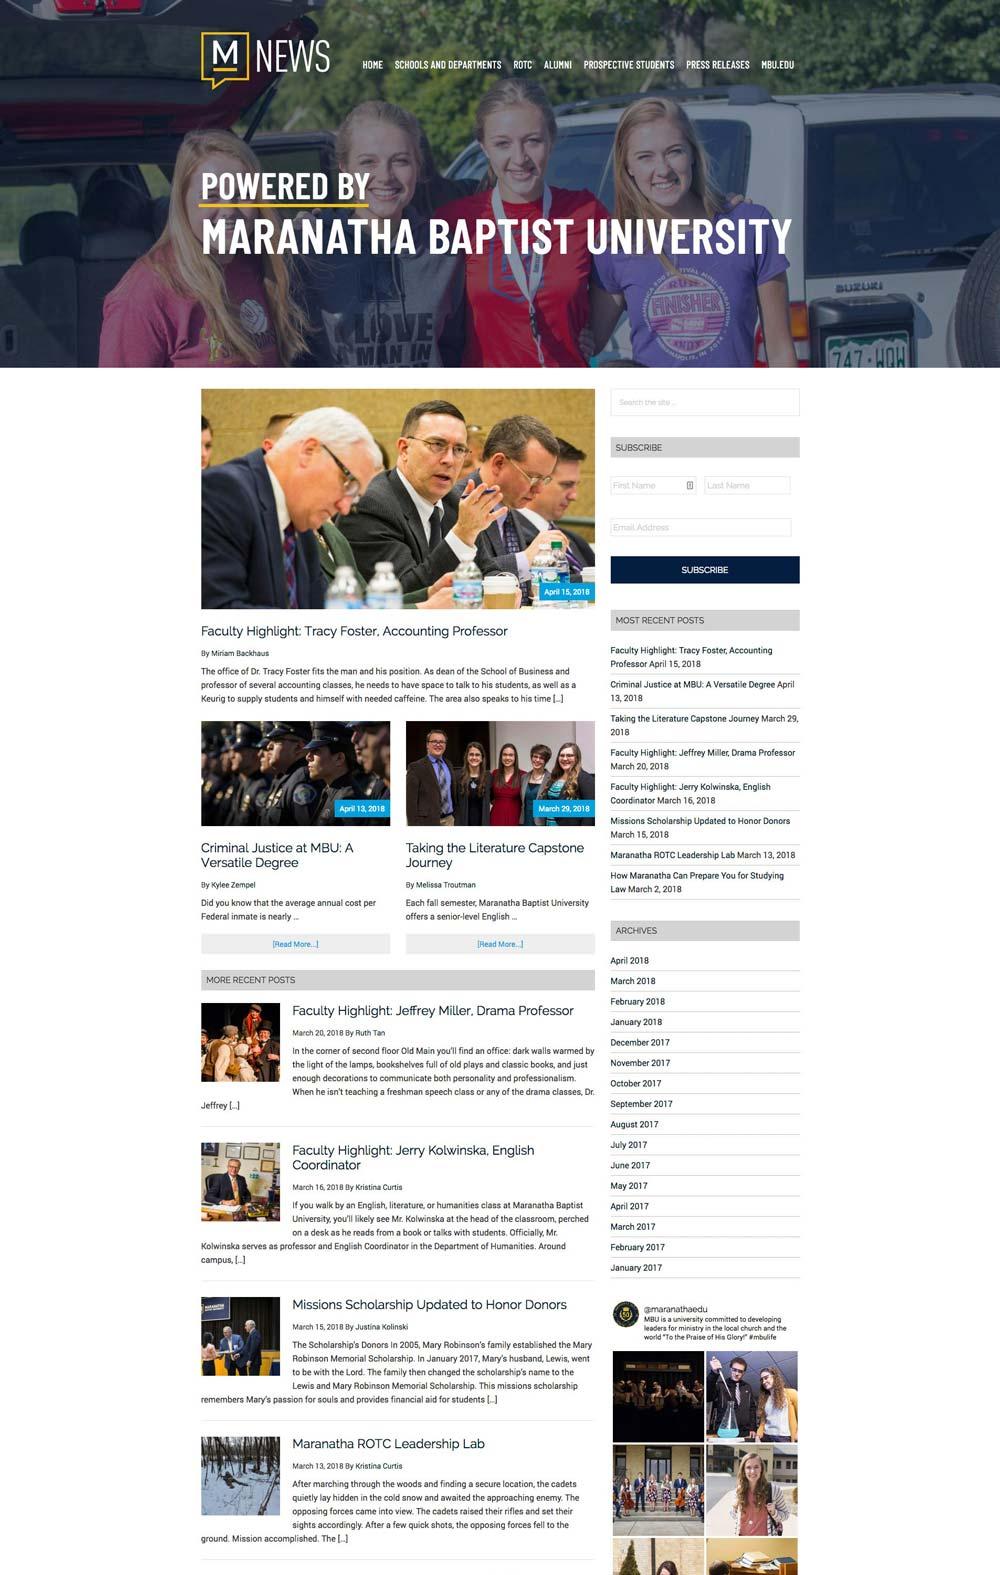 Marantha Baptist University News